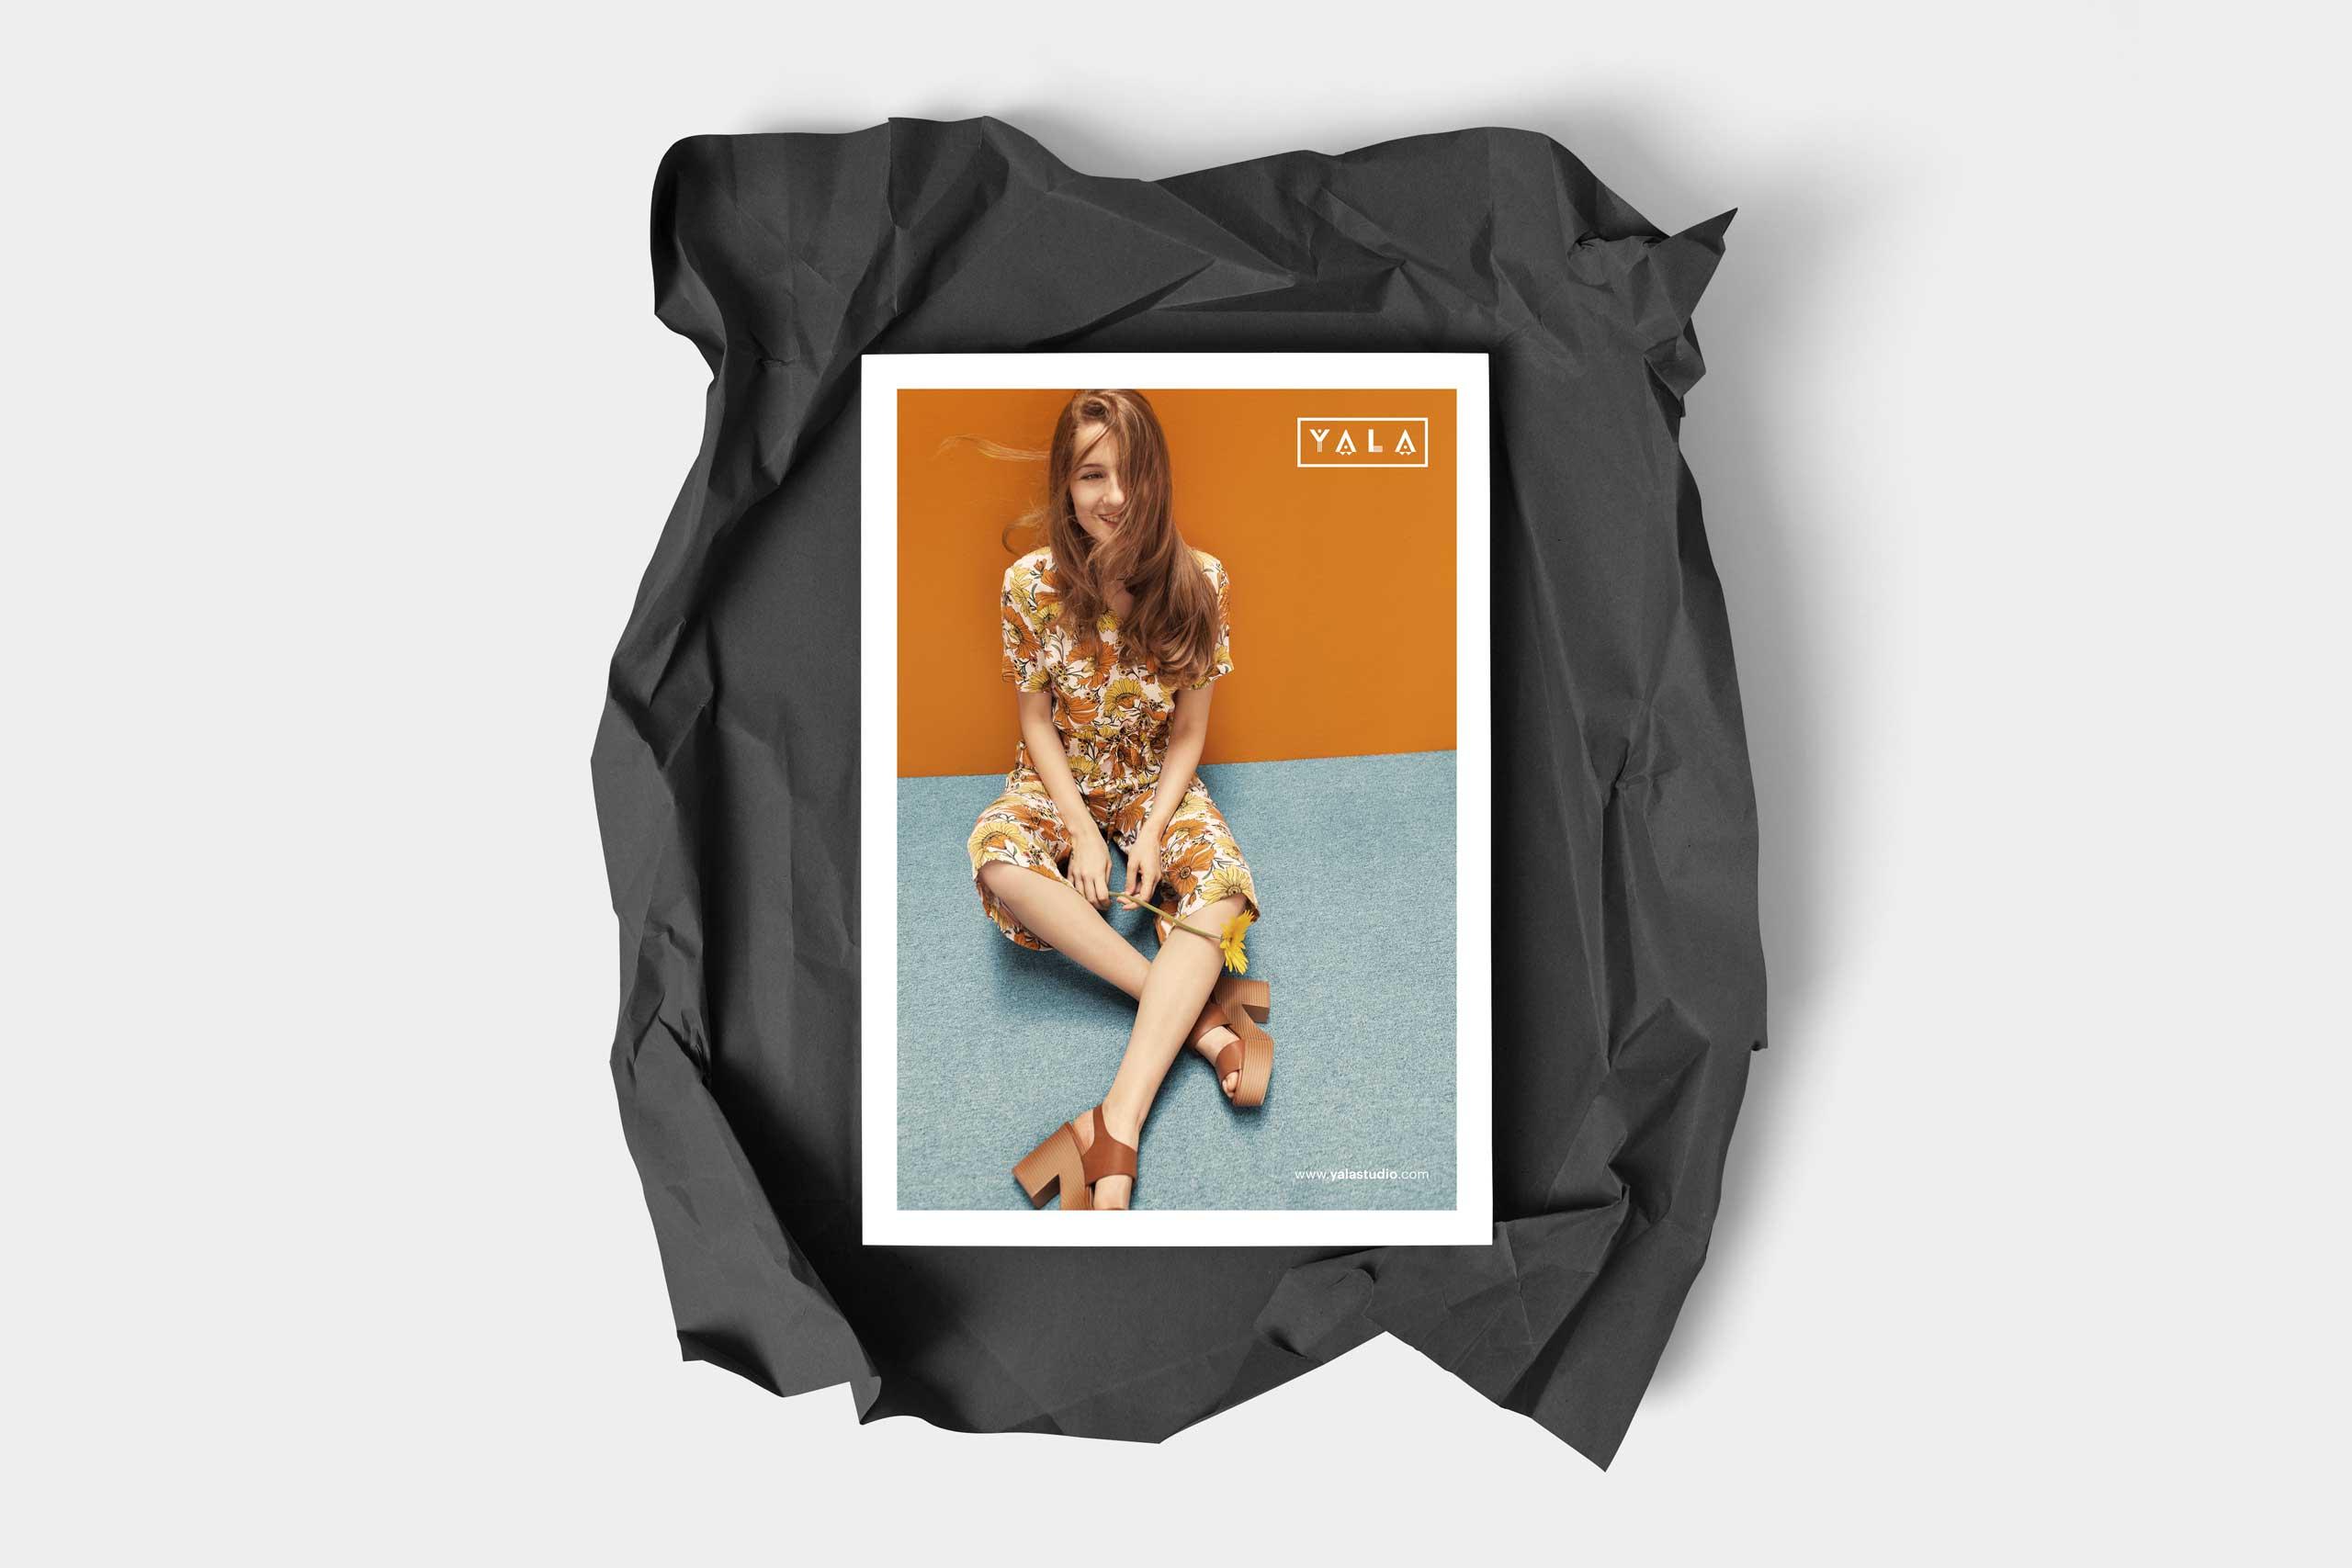 yala flyer design for fashion brand